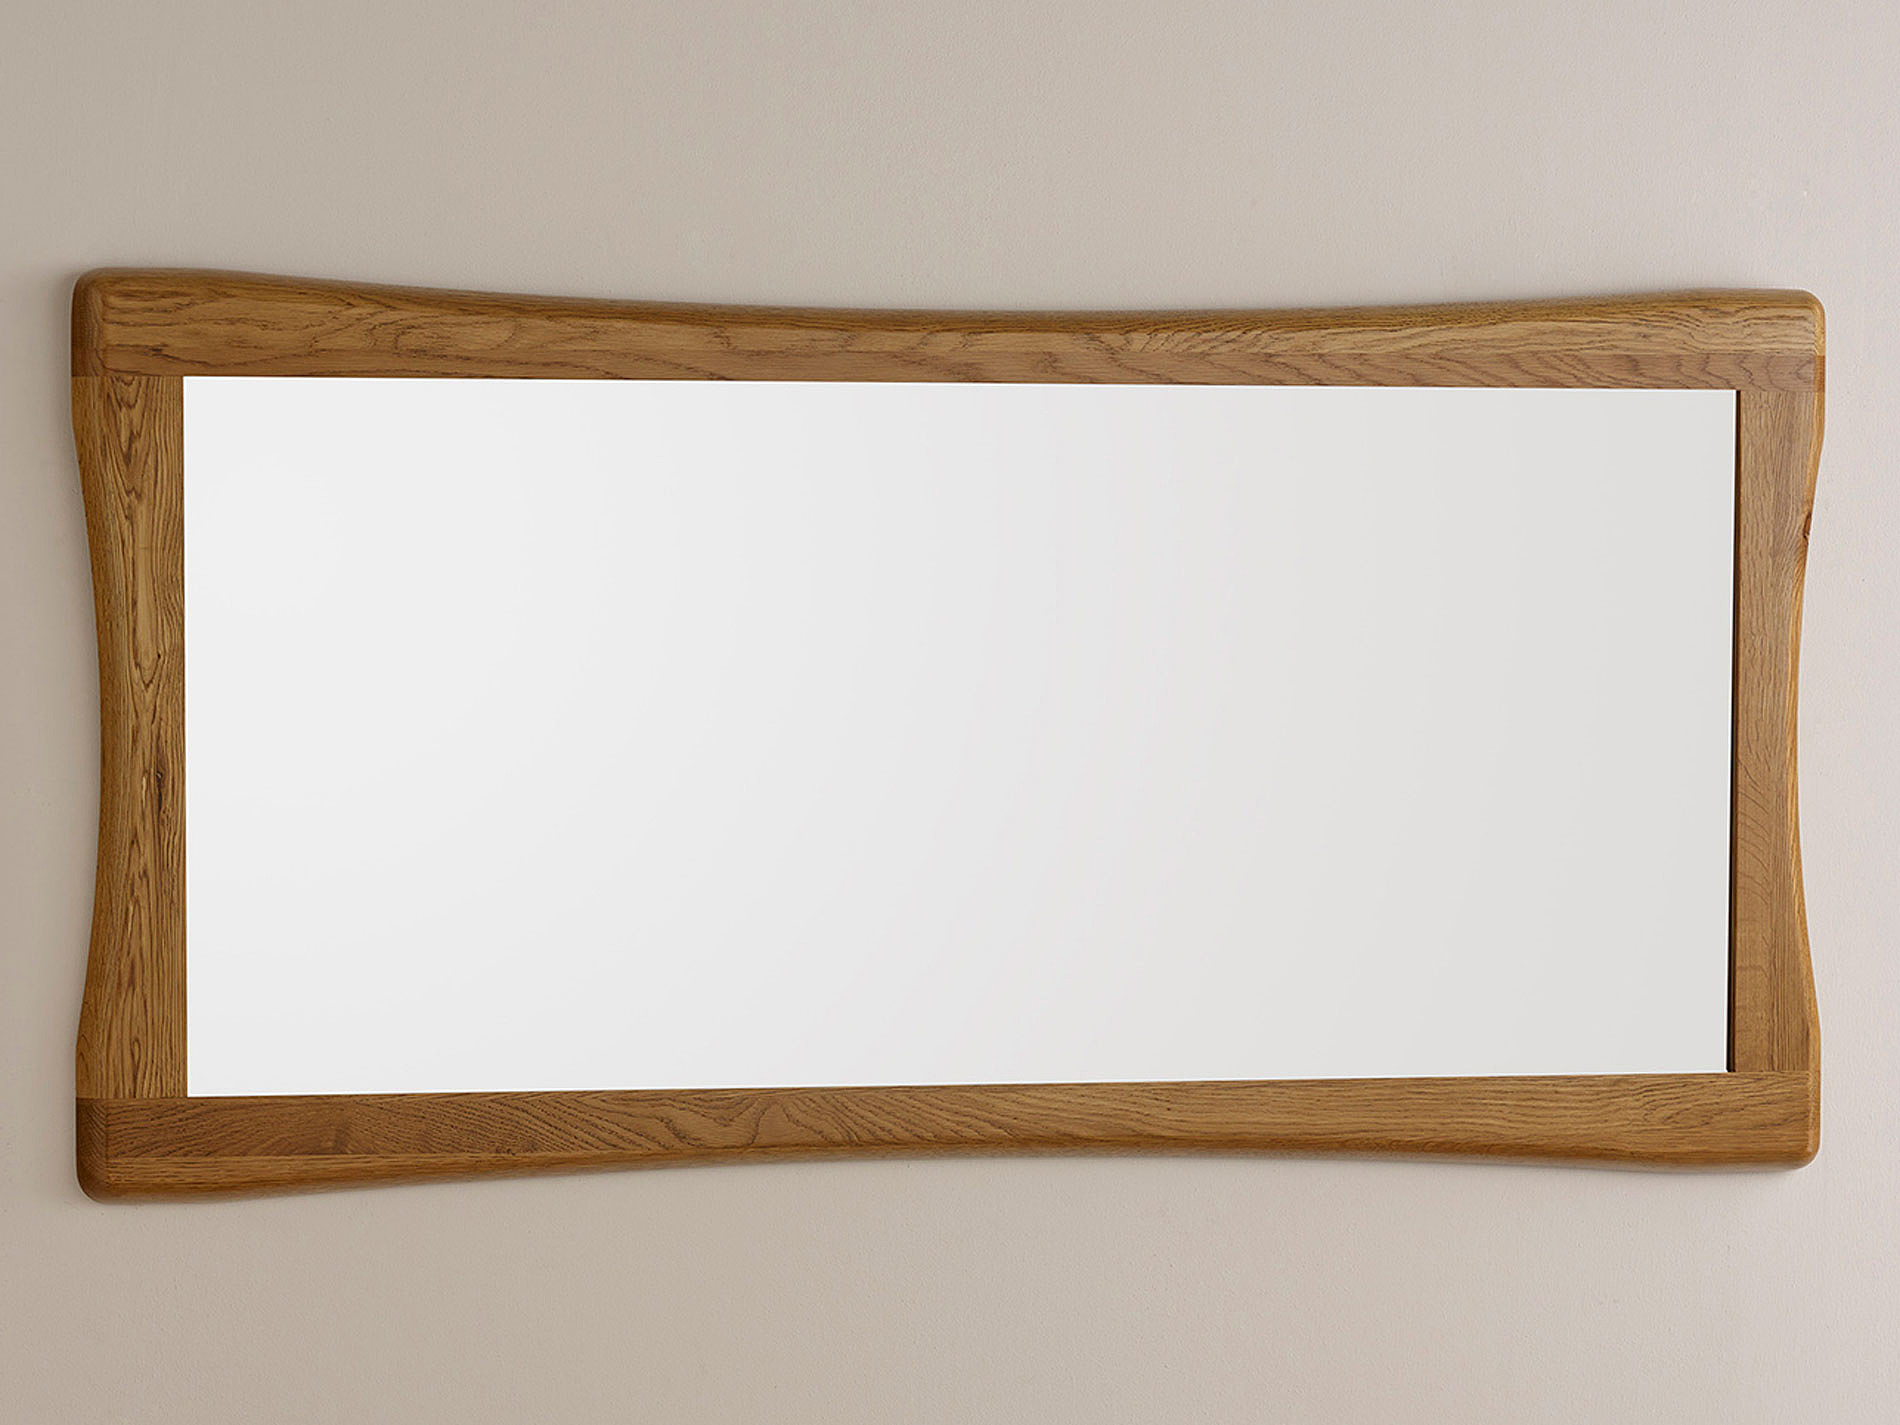 Orrick natural solid oak 1200mm x 600mm wall mirror for 4 x 5 wall mirror